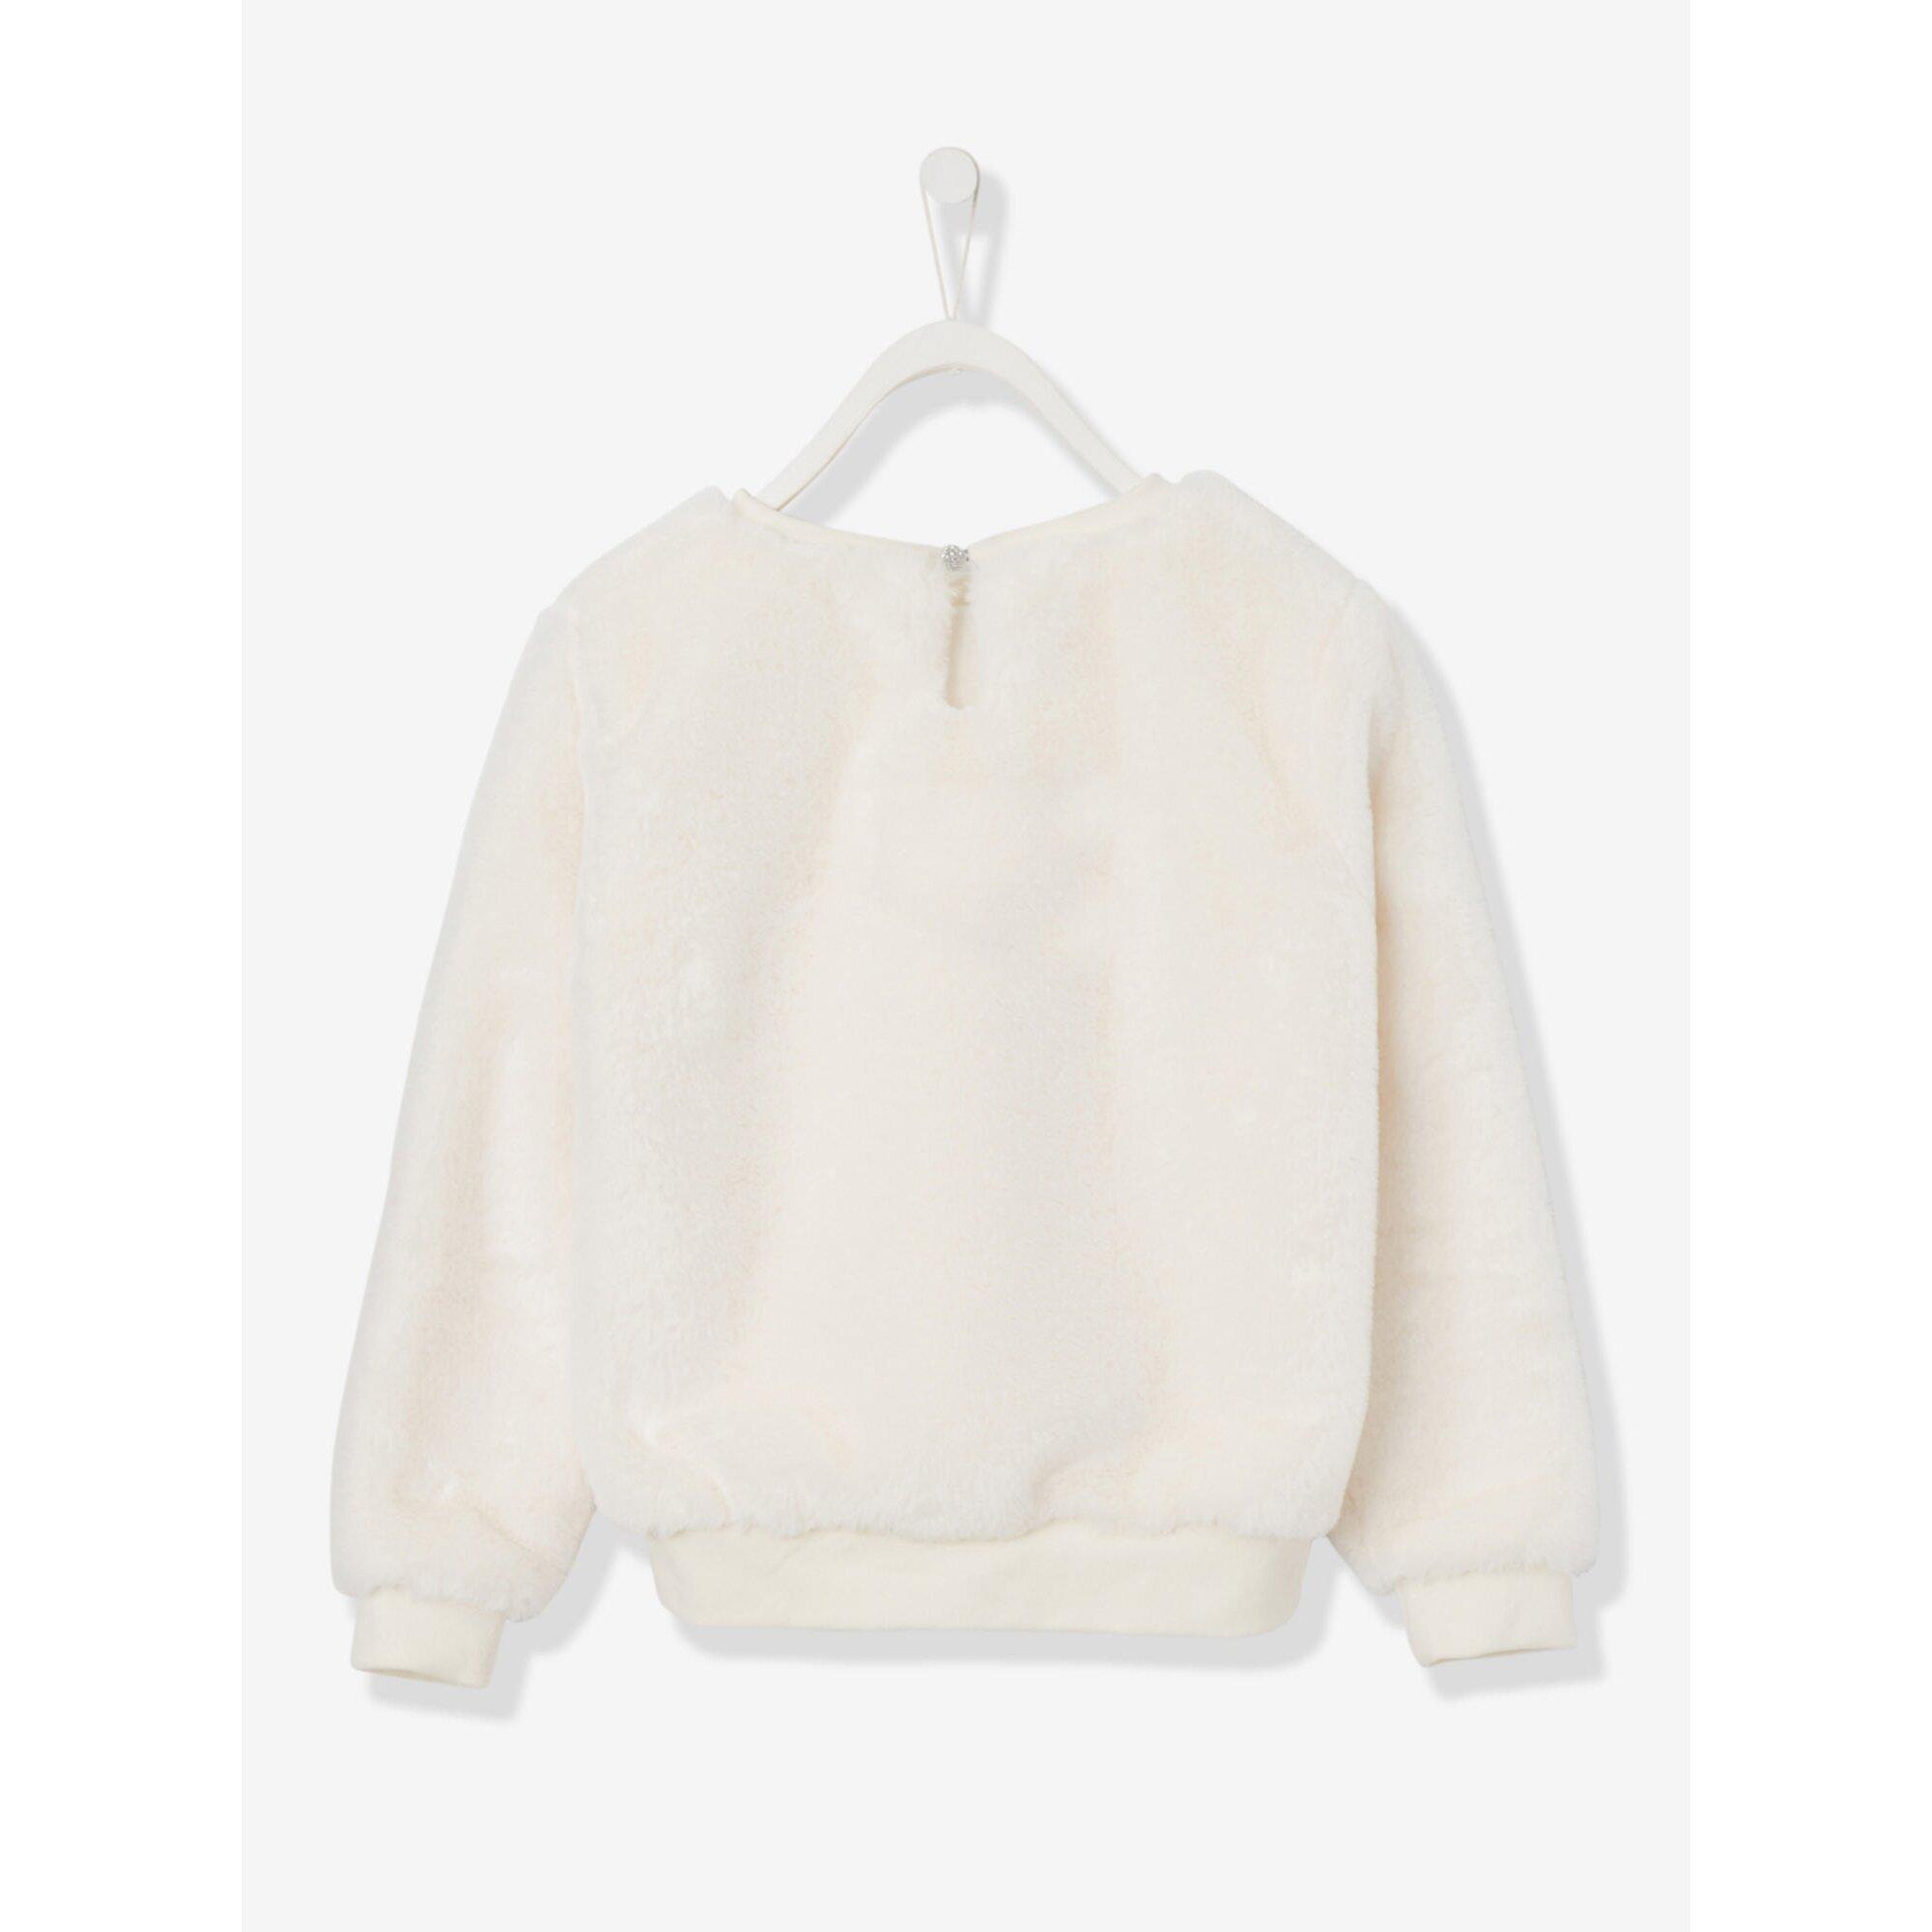 vertbaudet-madchen-fell-pullover, 25.99 EUR @ babywalz-de